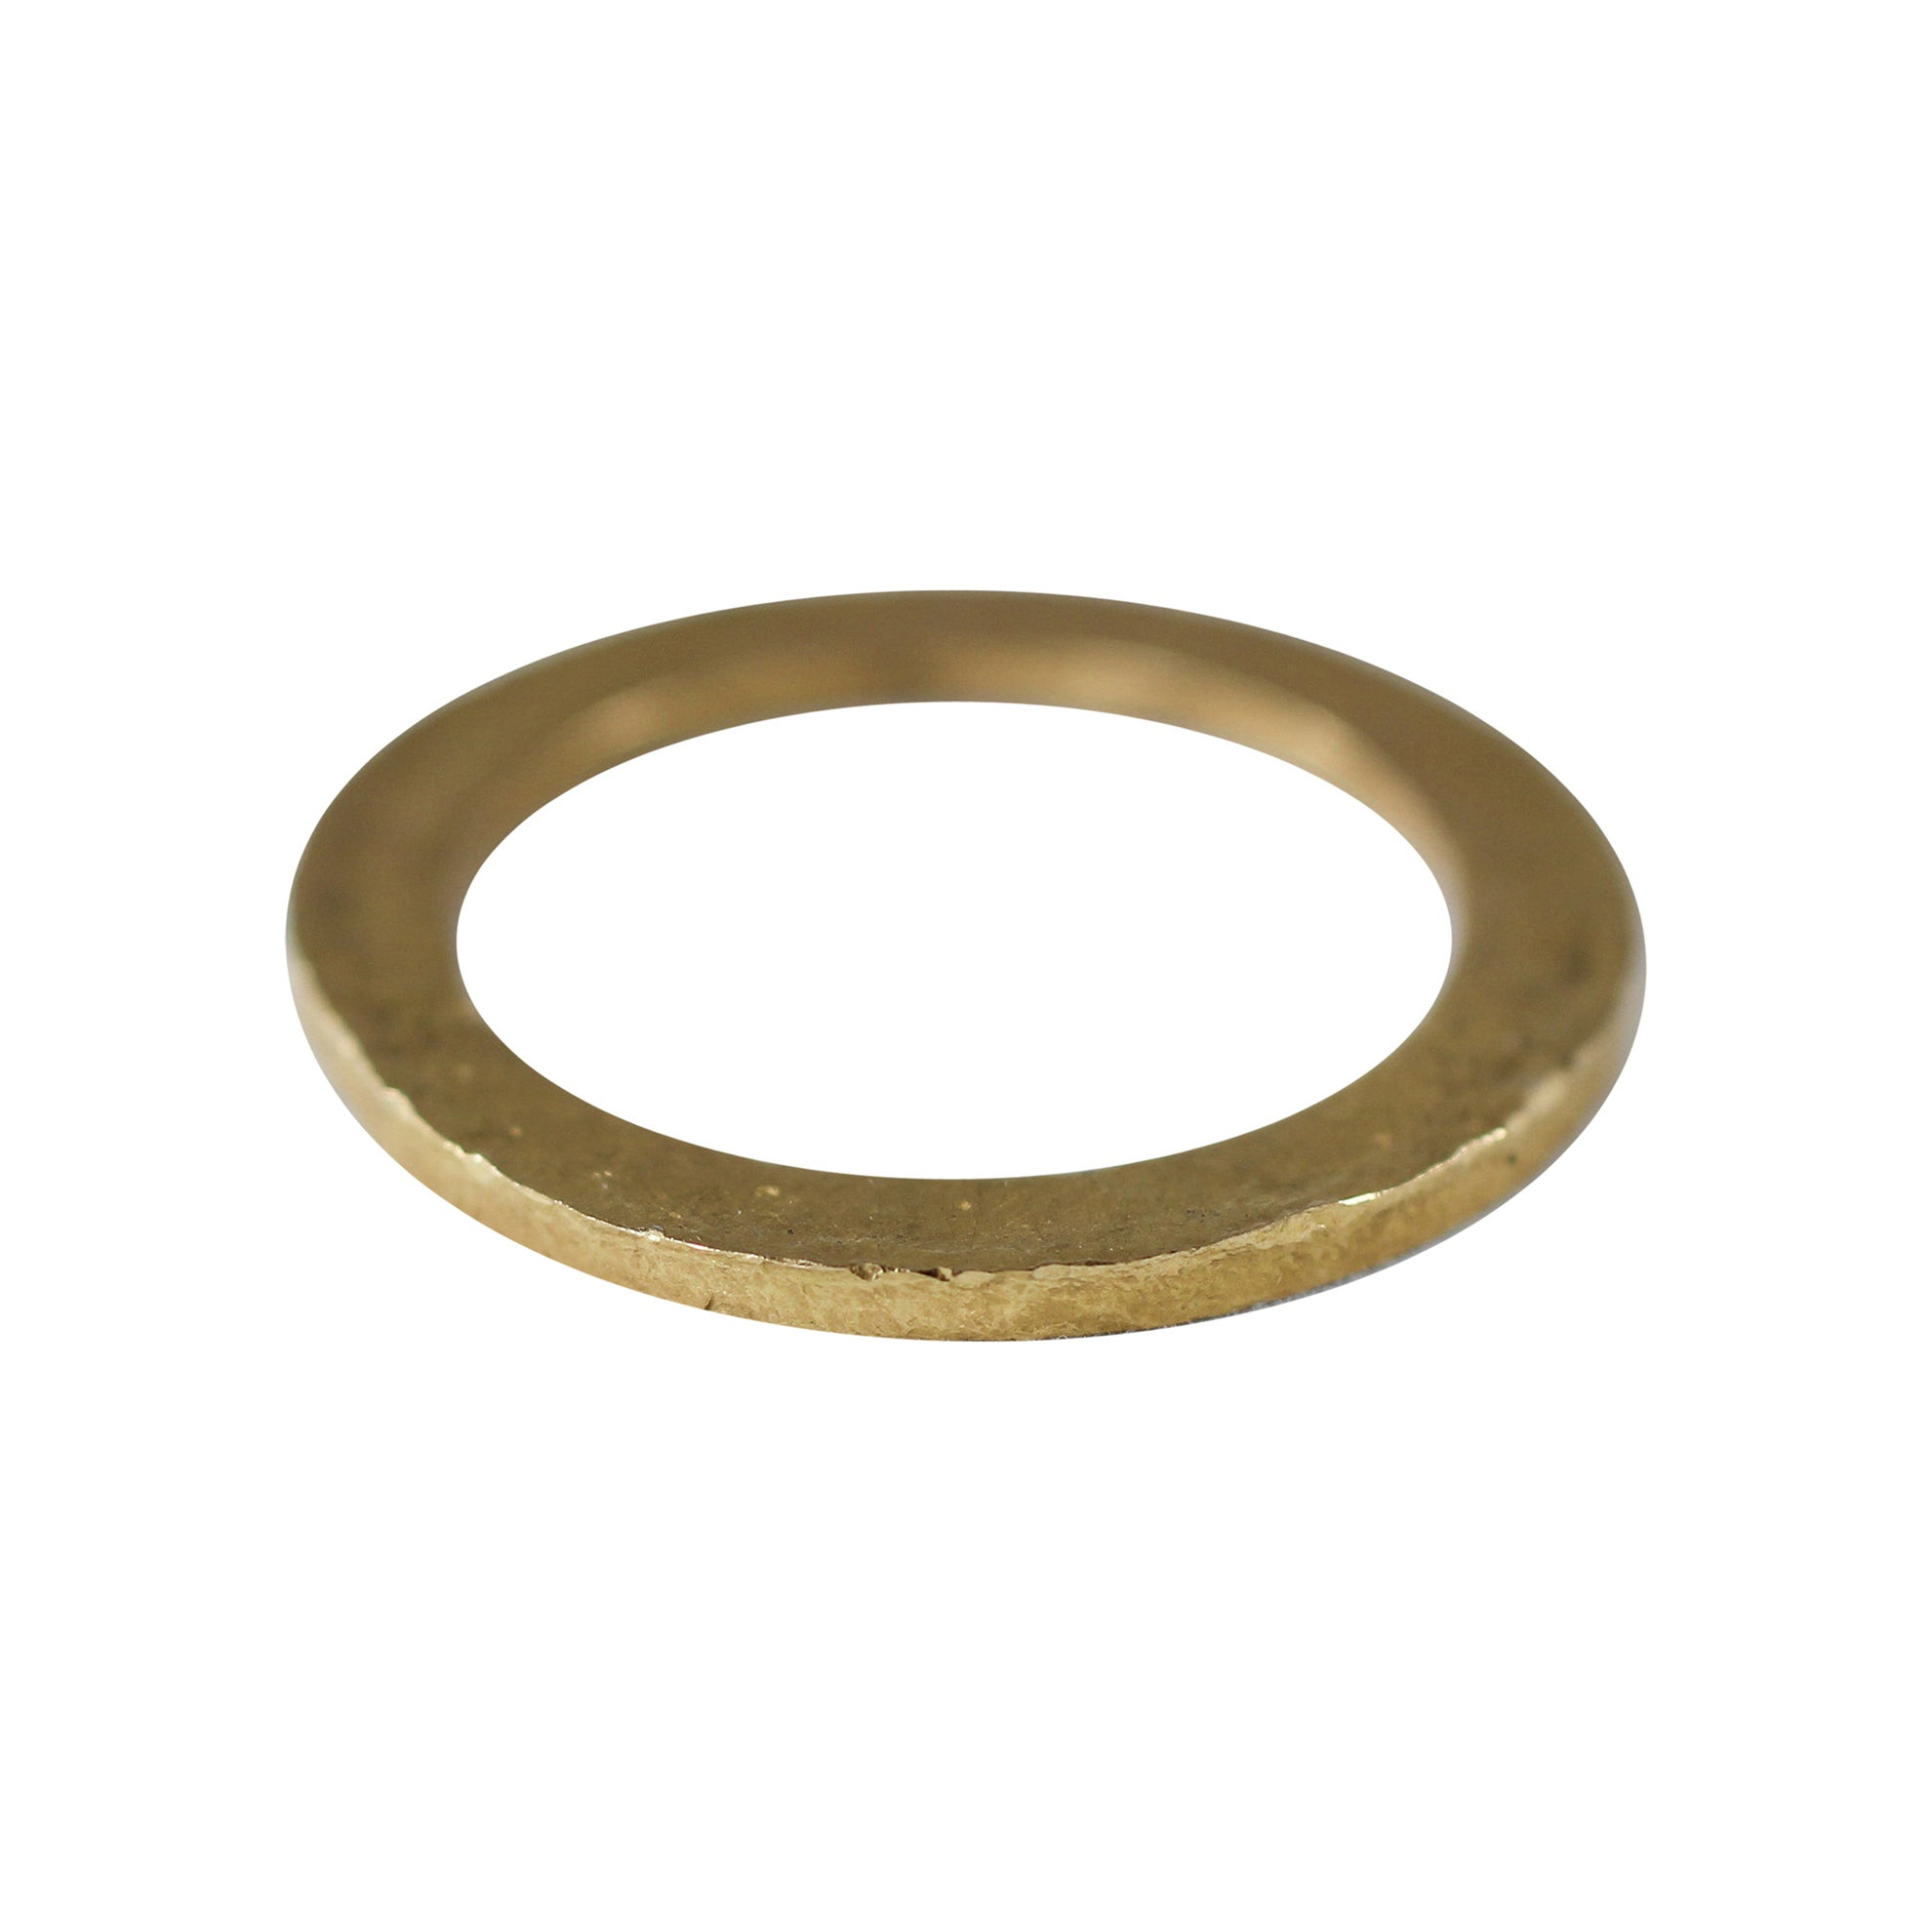 Bridal Wedding Band Ring 18K Gold Modern for Man or Woman Stacking Design